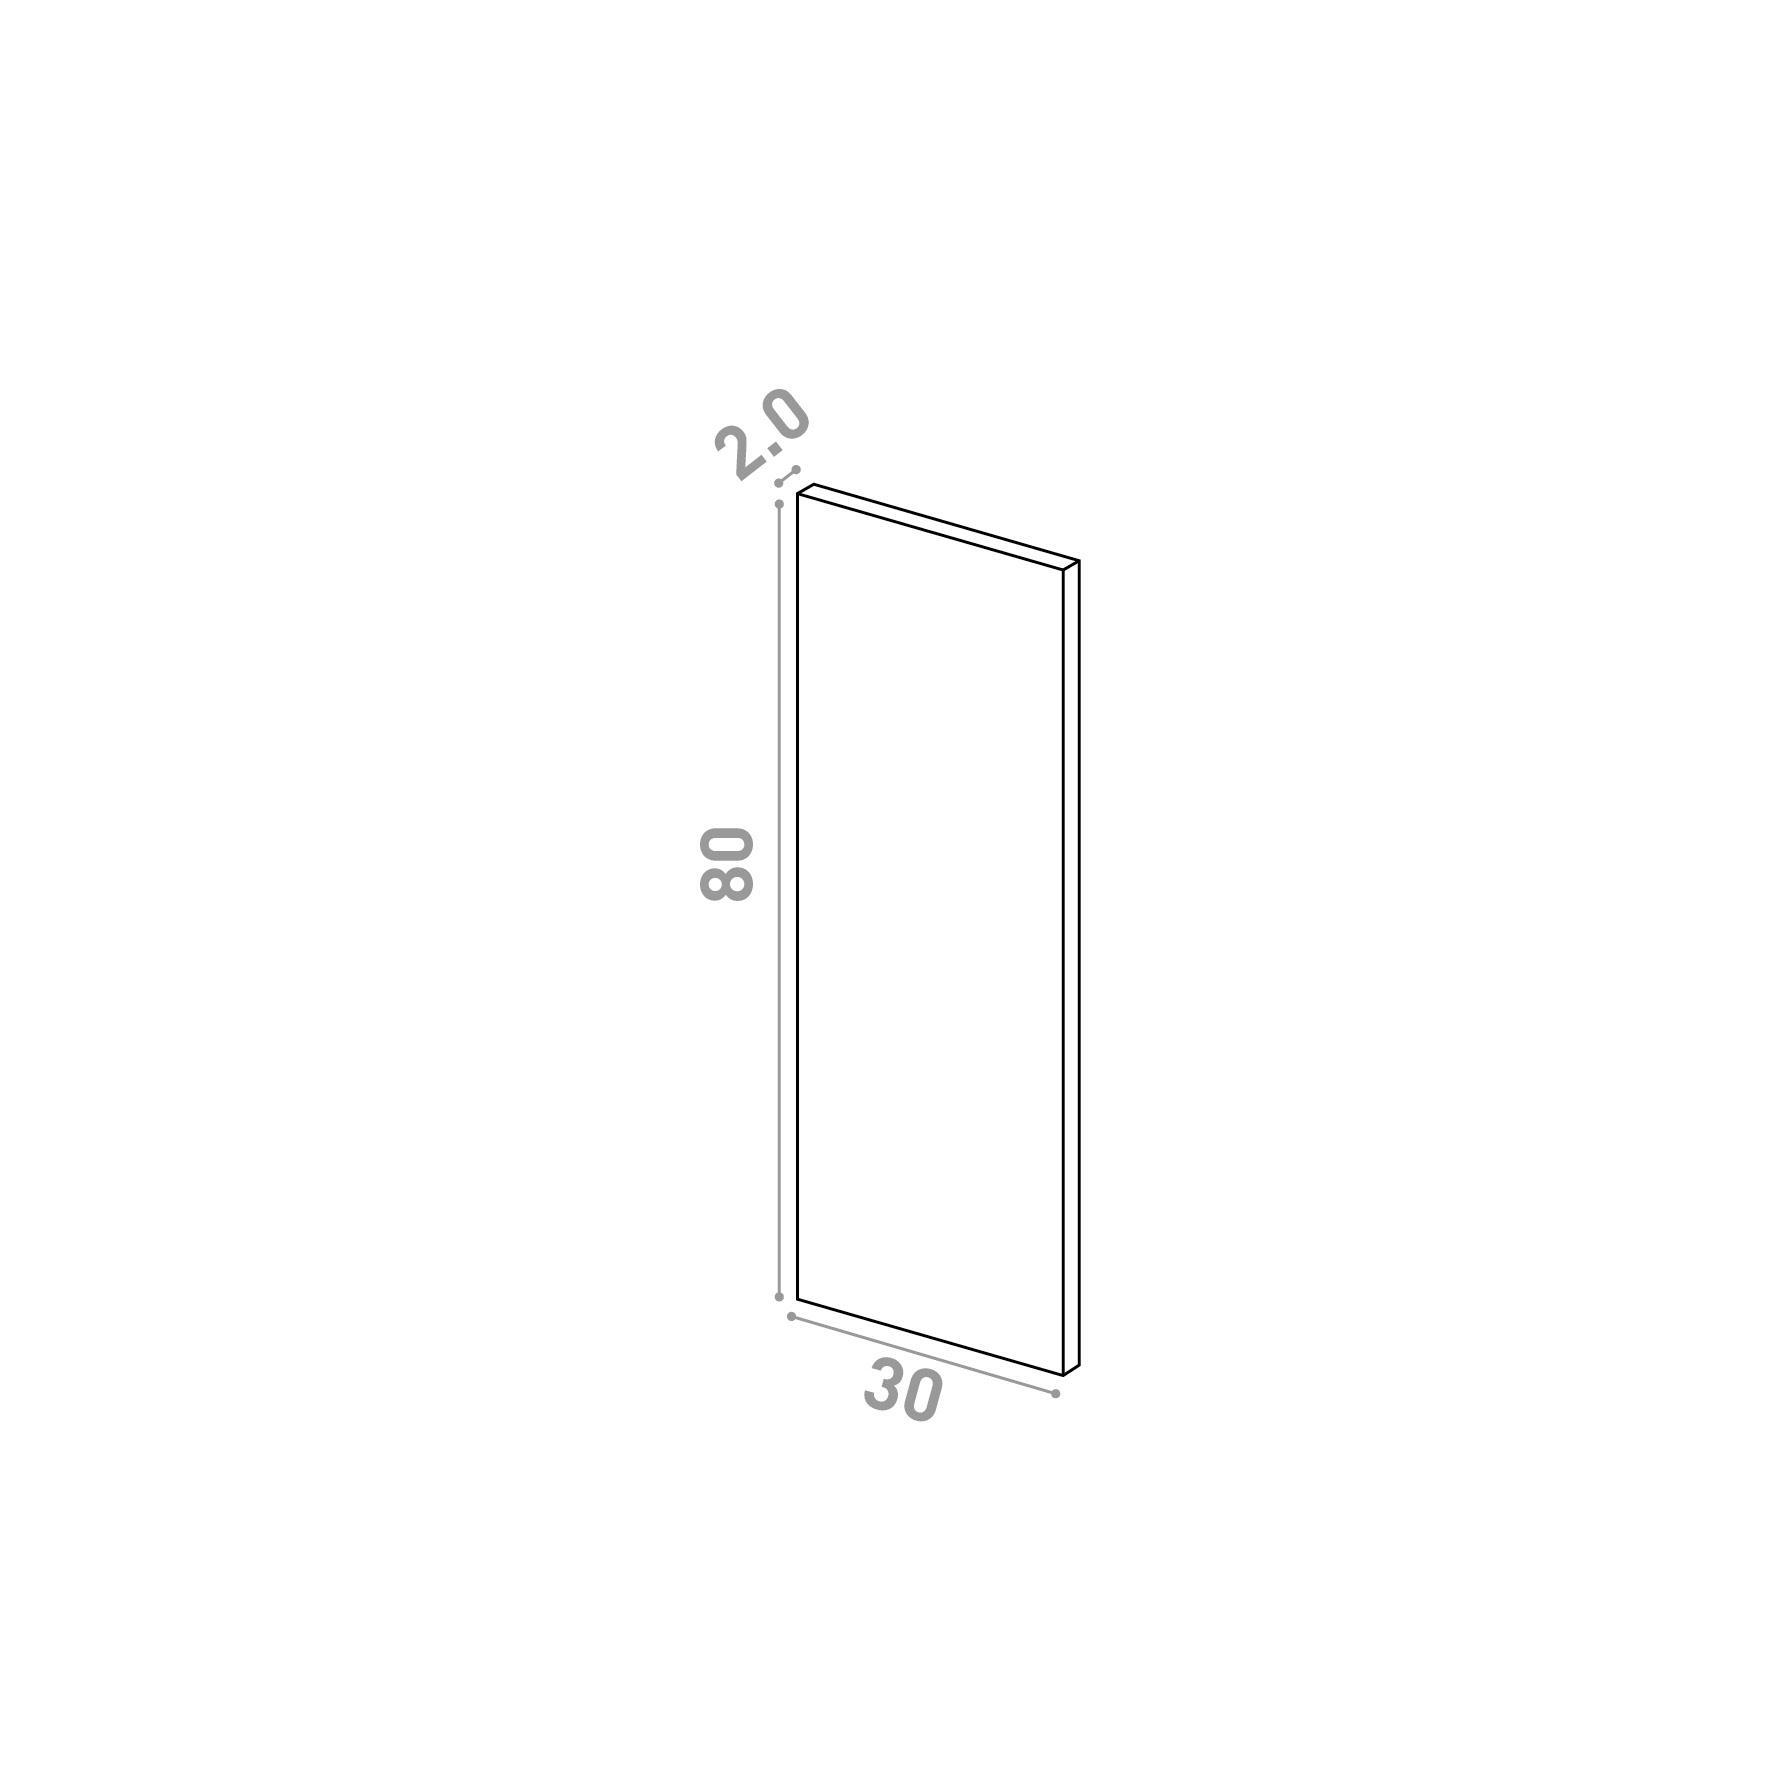 Porte 30X80cm   design lisse   chêne naturel